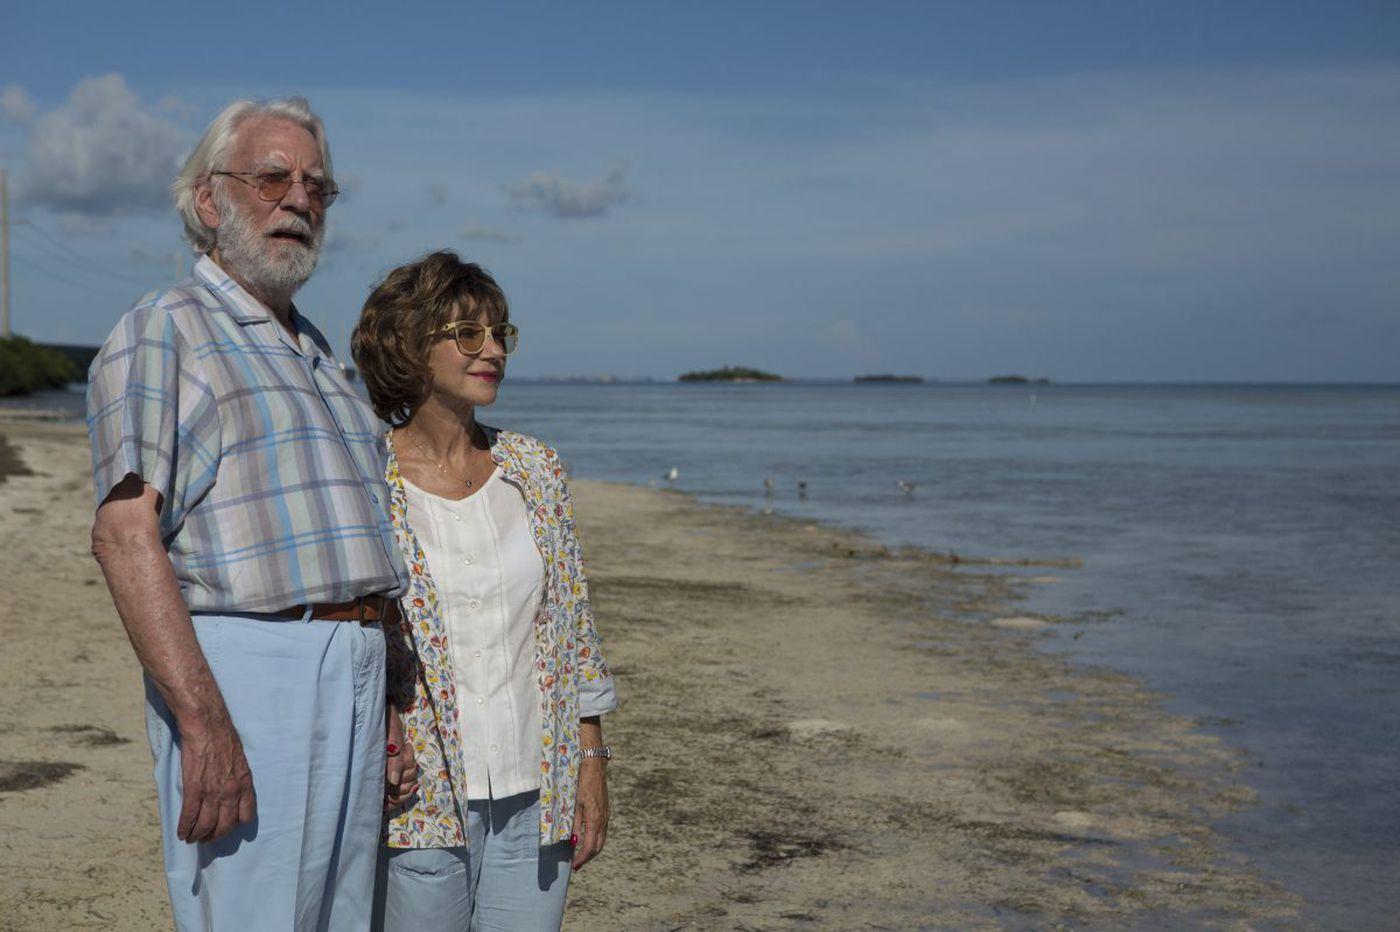 Helen Mirren, Donald Sutherland hit dead end in road movie 'The Leisure Seeker.'